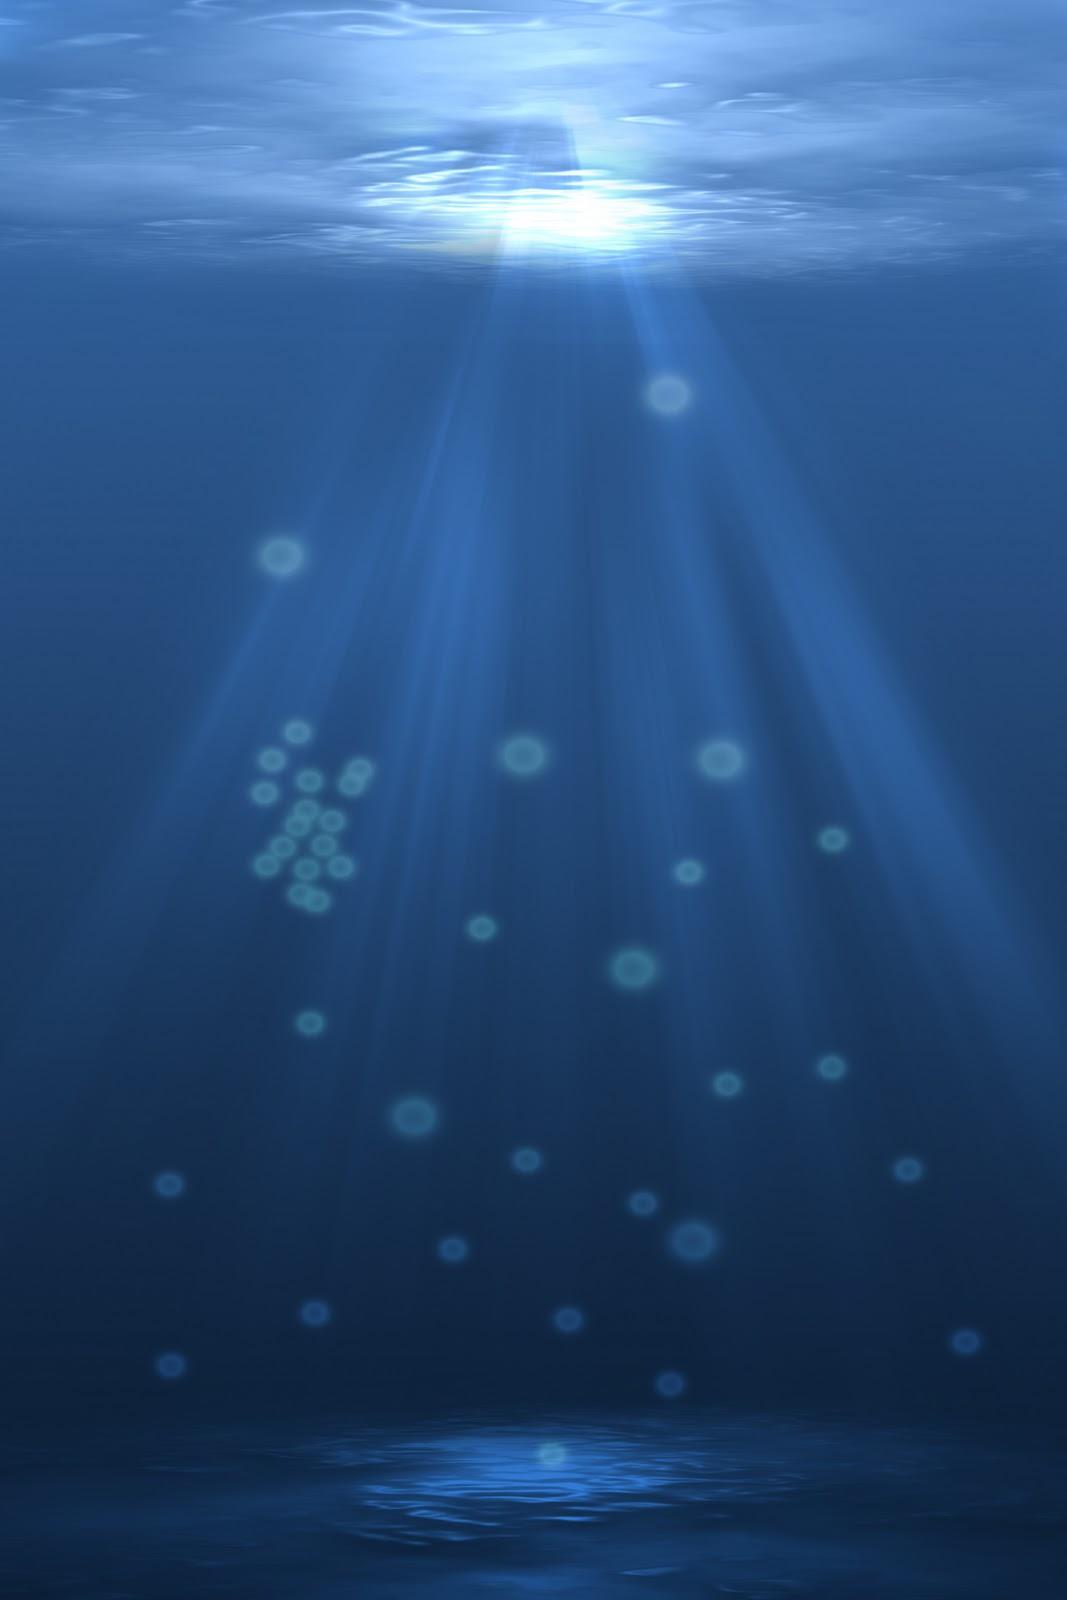 http://1.bp.blogspot.com/-TEsmEyvLnpU/Tqfp2tGkSeI/AAAAAAAAAEE/86znosIgfck/s1600/under+sea.jpg